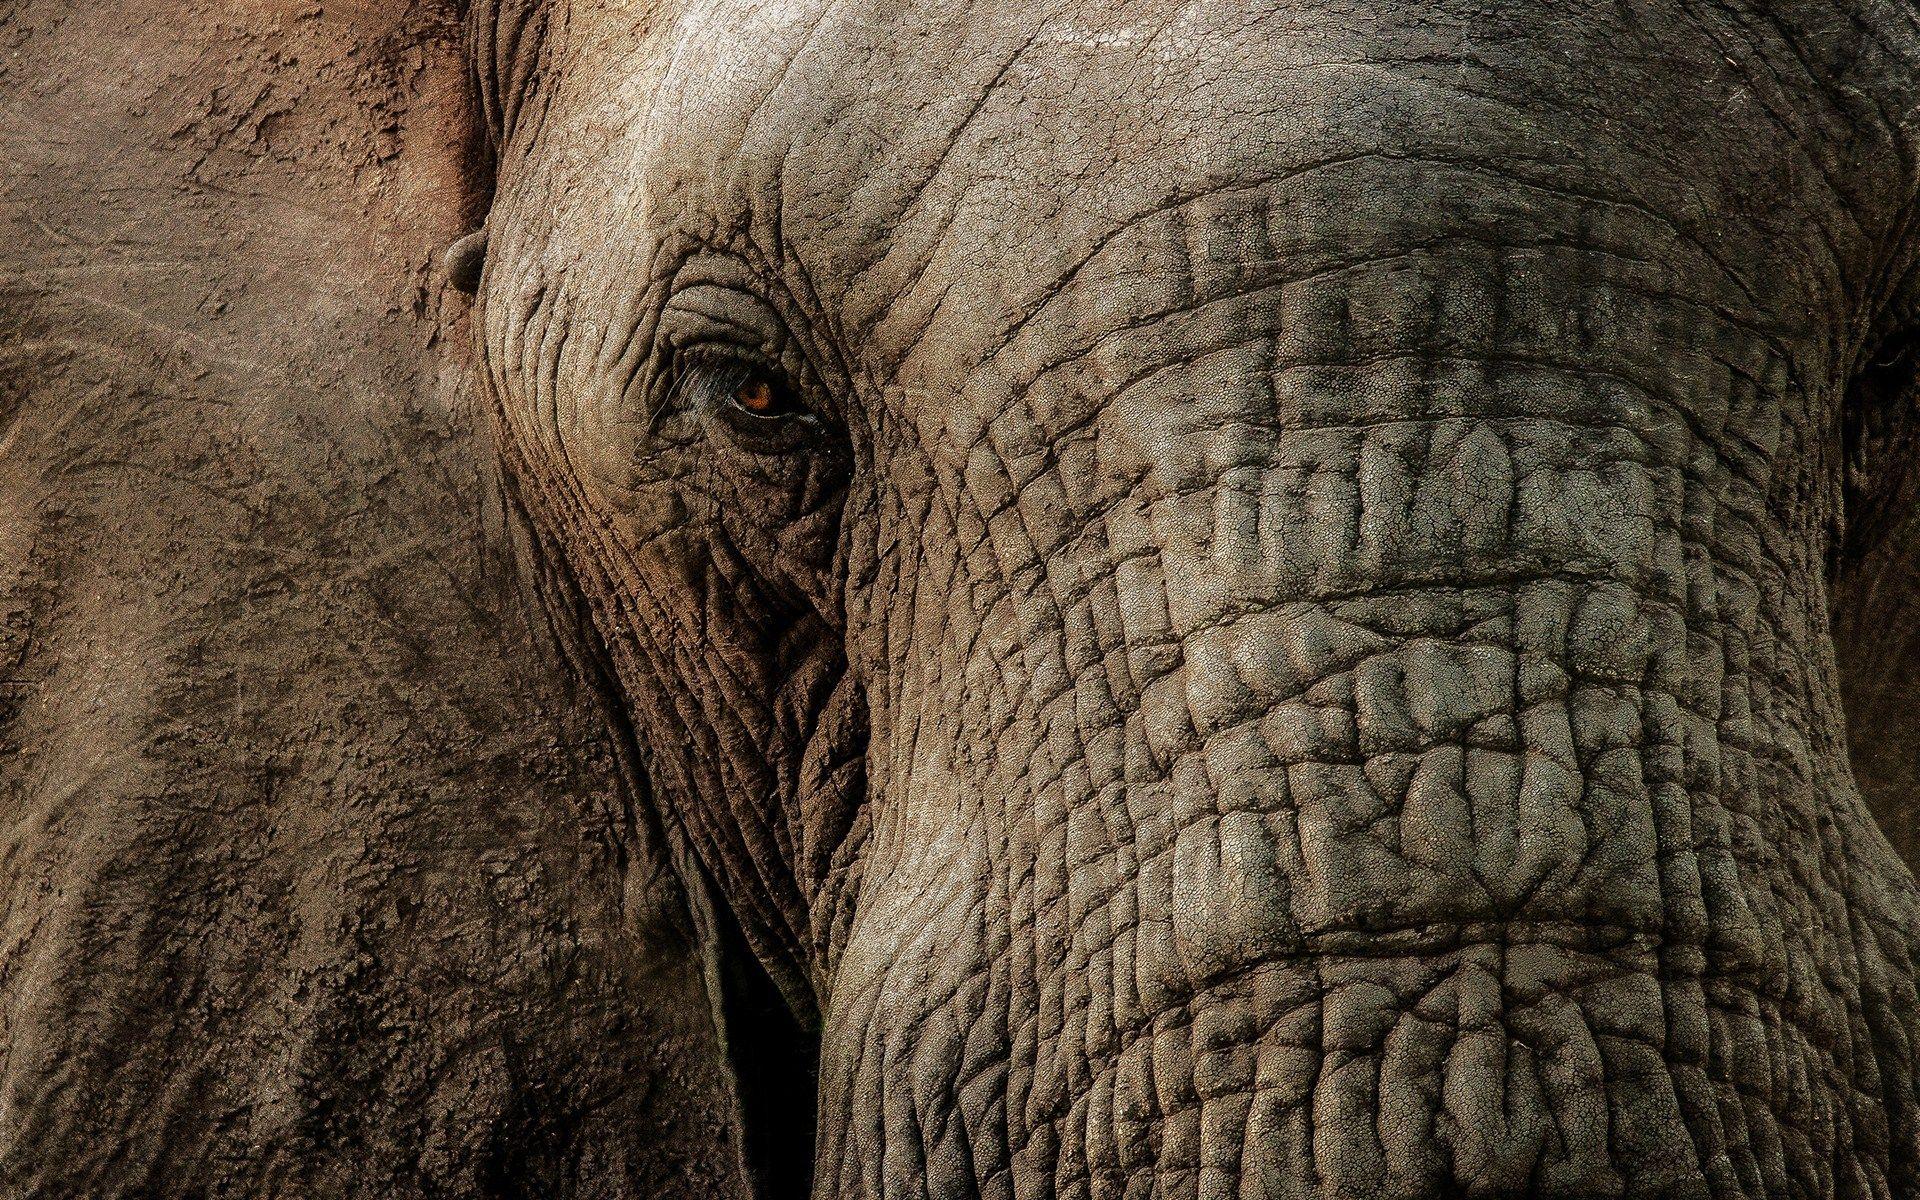 elephant iphone wallpaper